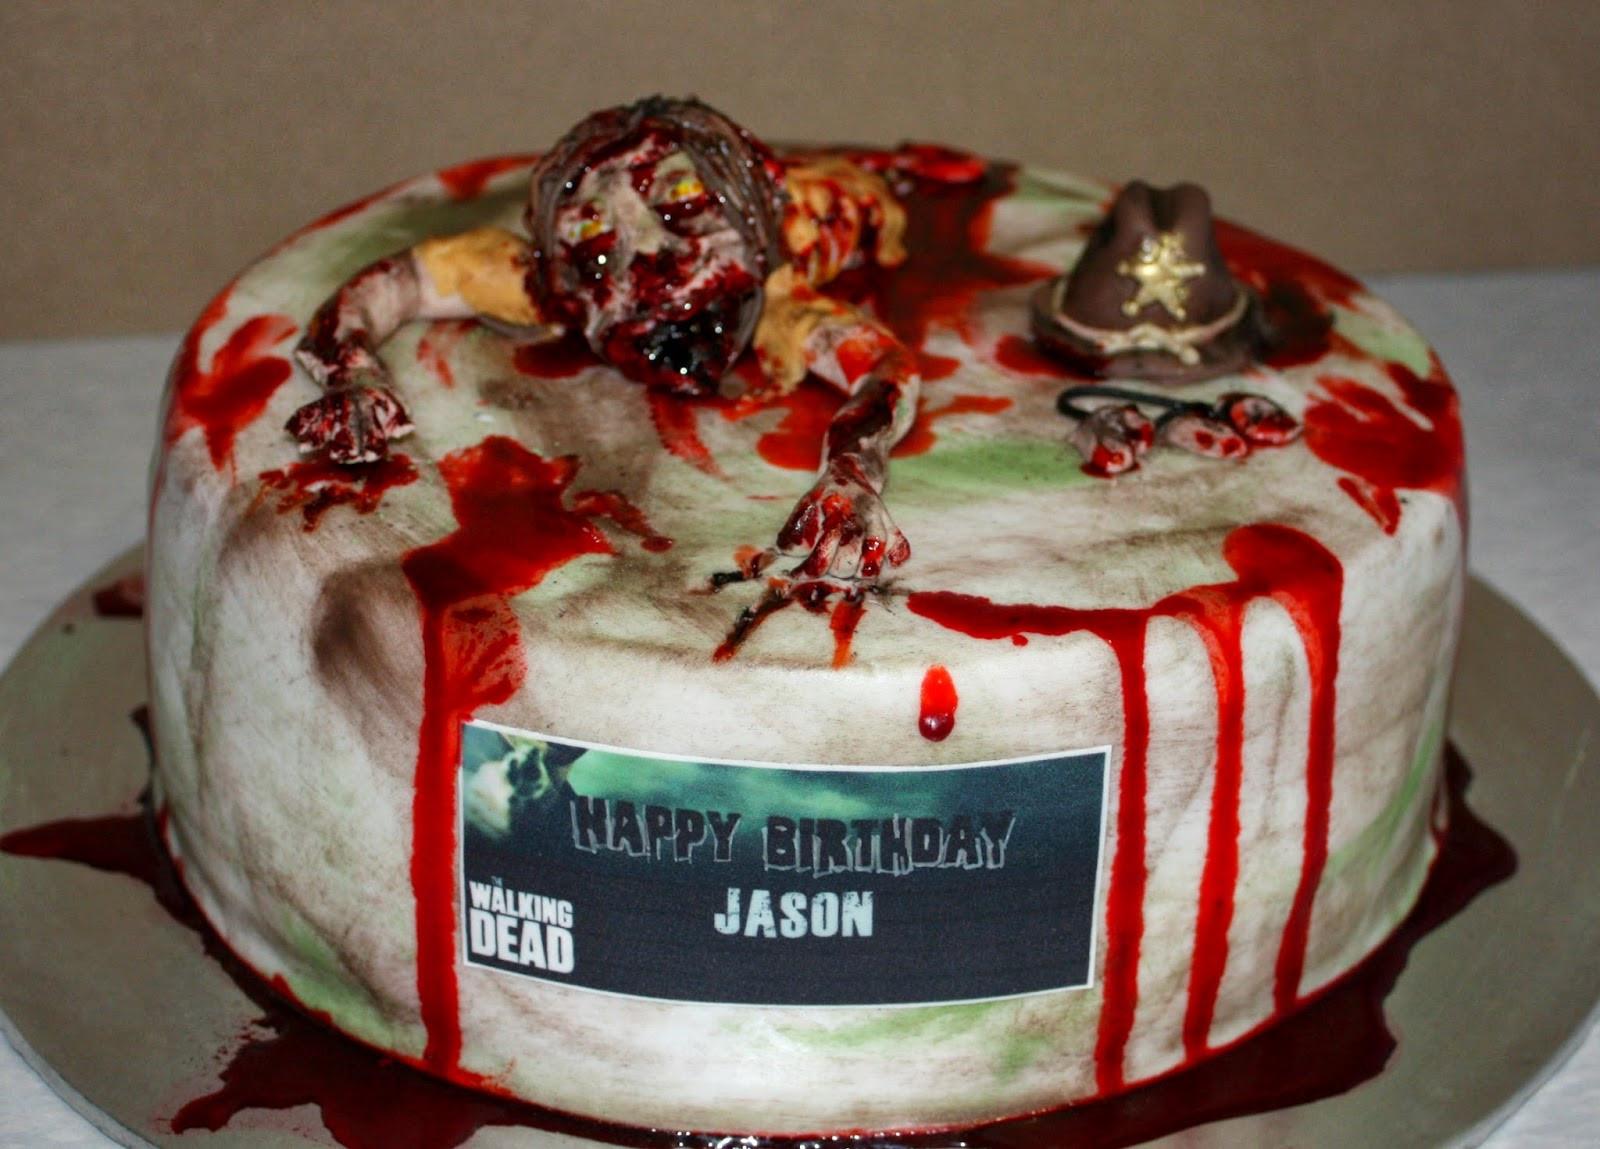 Walking Dead Wedding Cakes  Fandom Friday Awesome Walking Dead Cakes